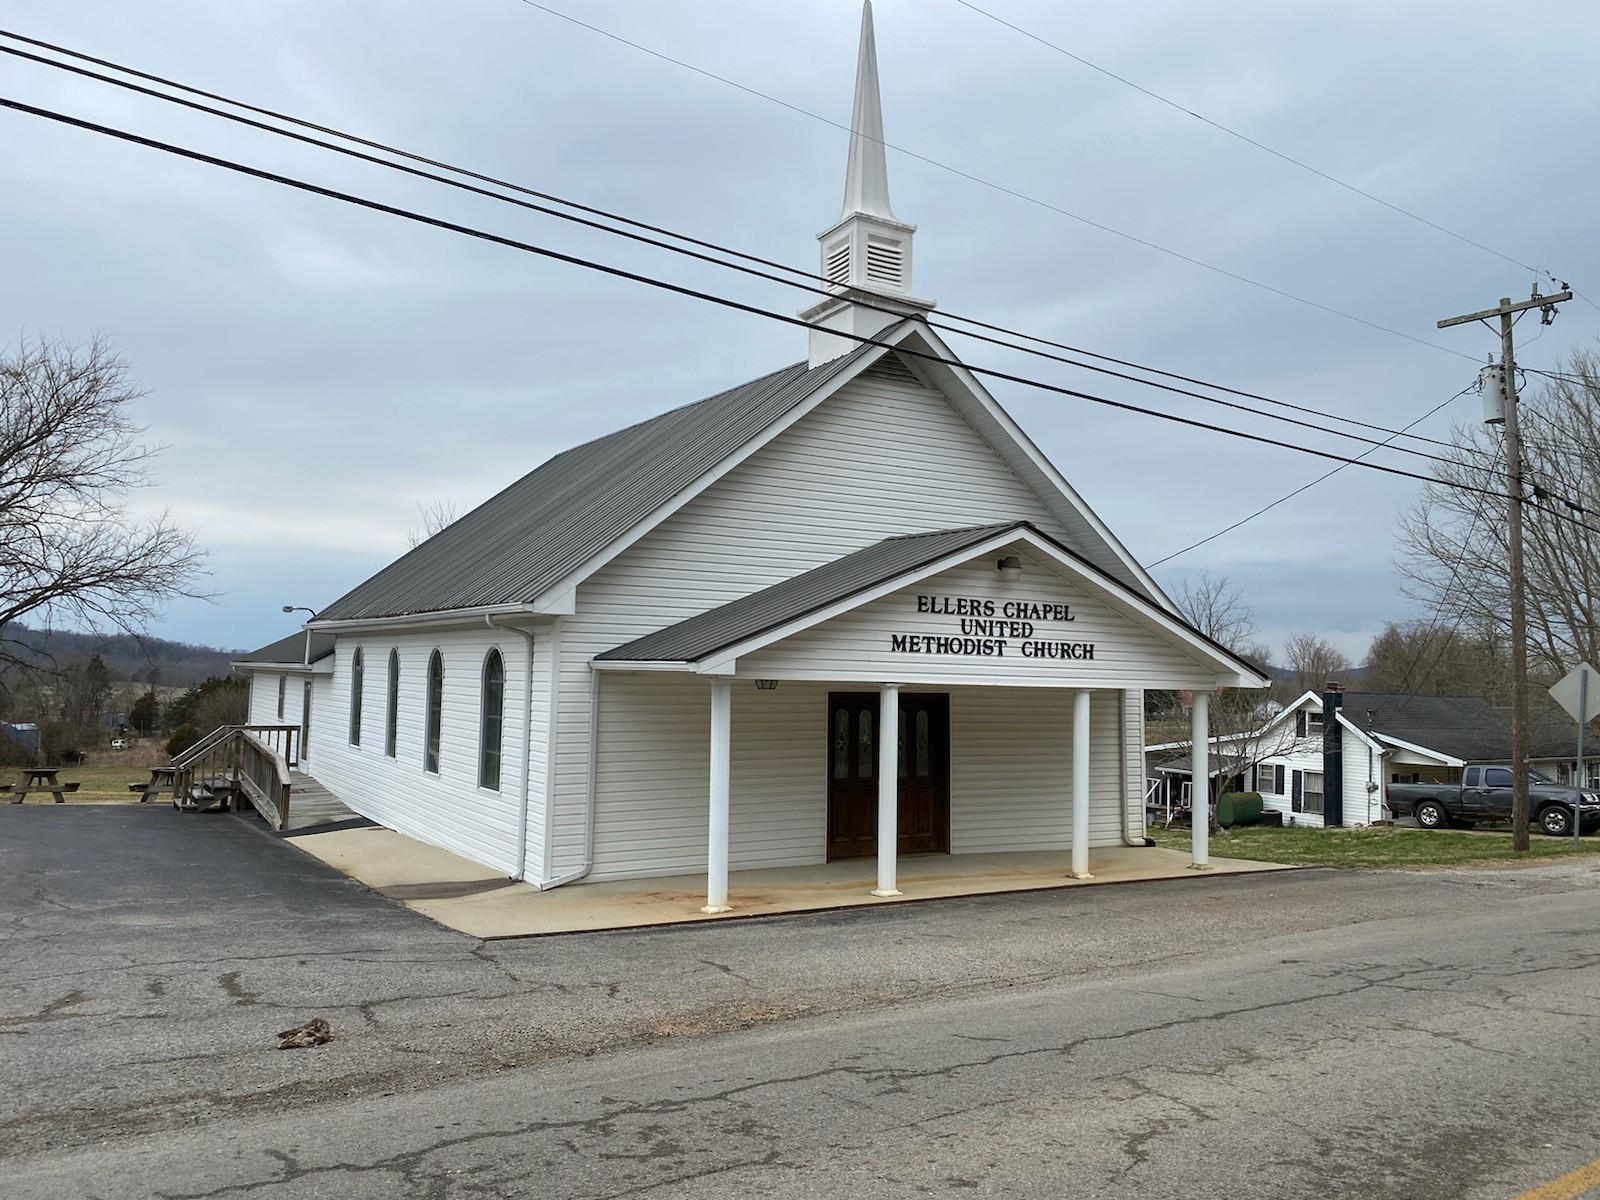 Ellers Chapel United Methodist Church